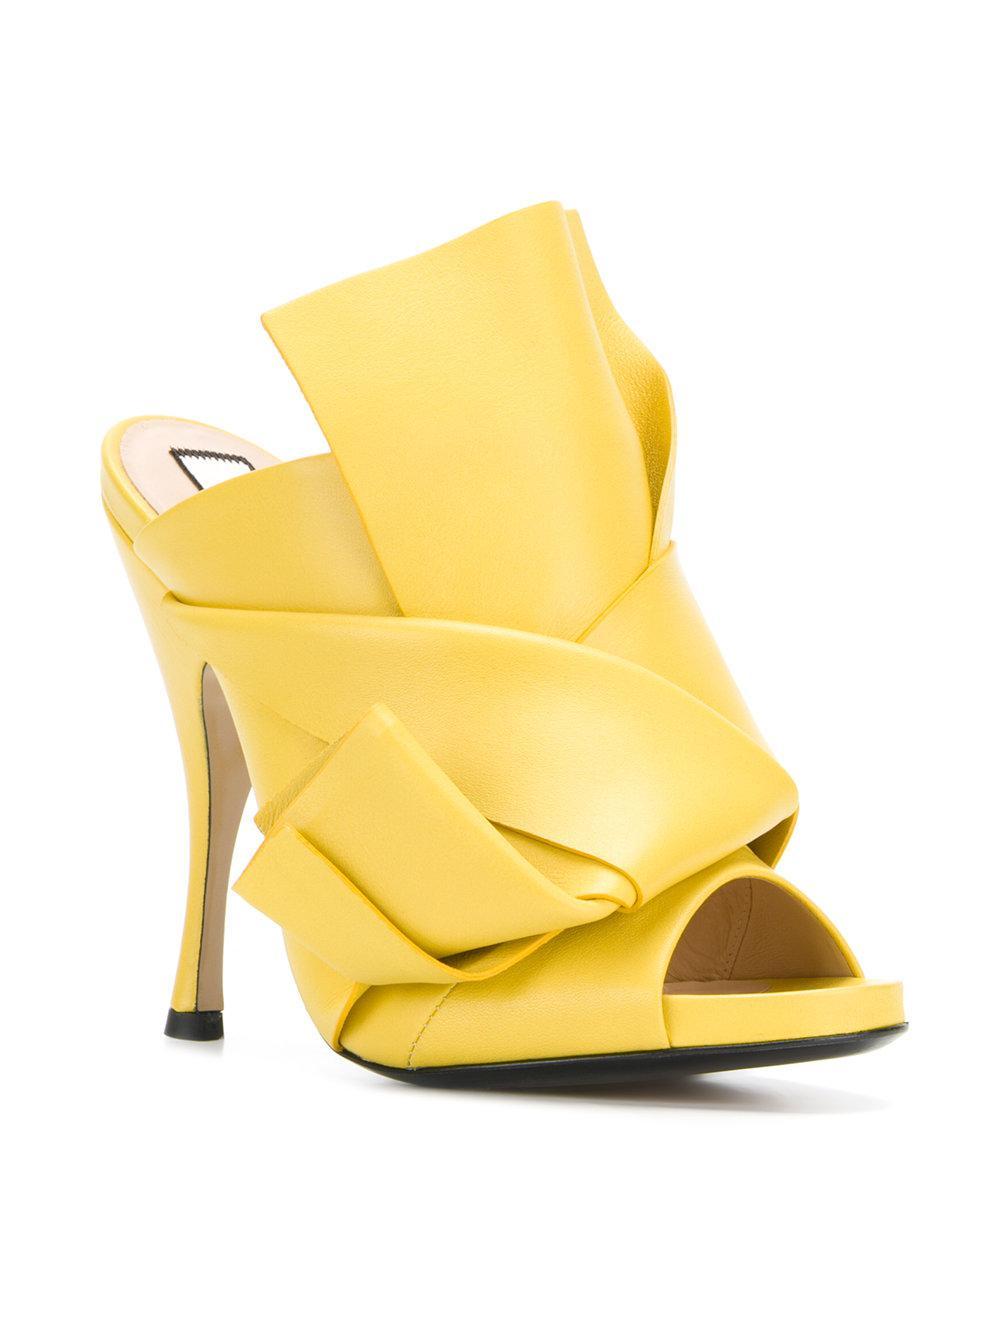 abstract bow platform sandals - Yellow & Orange N°21 B3lZHCC